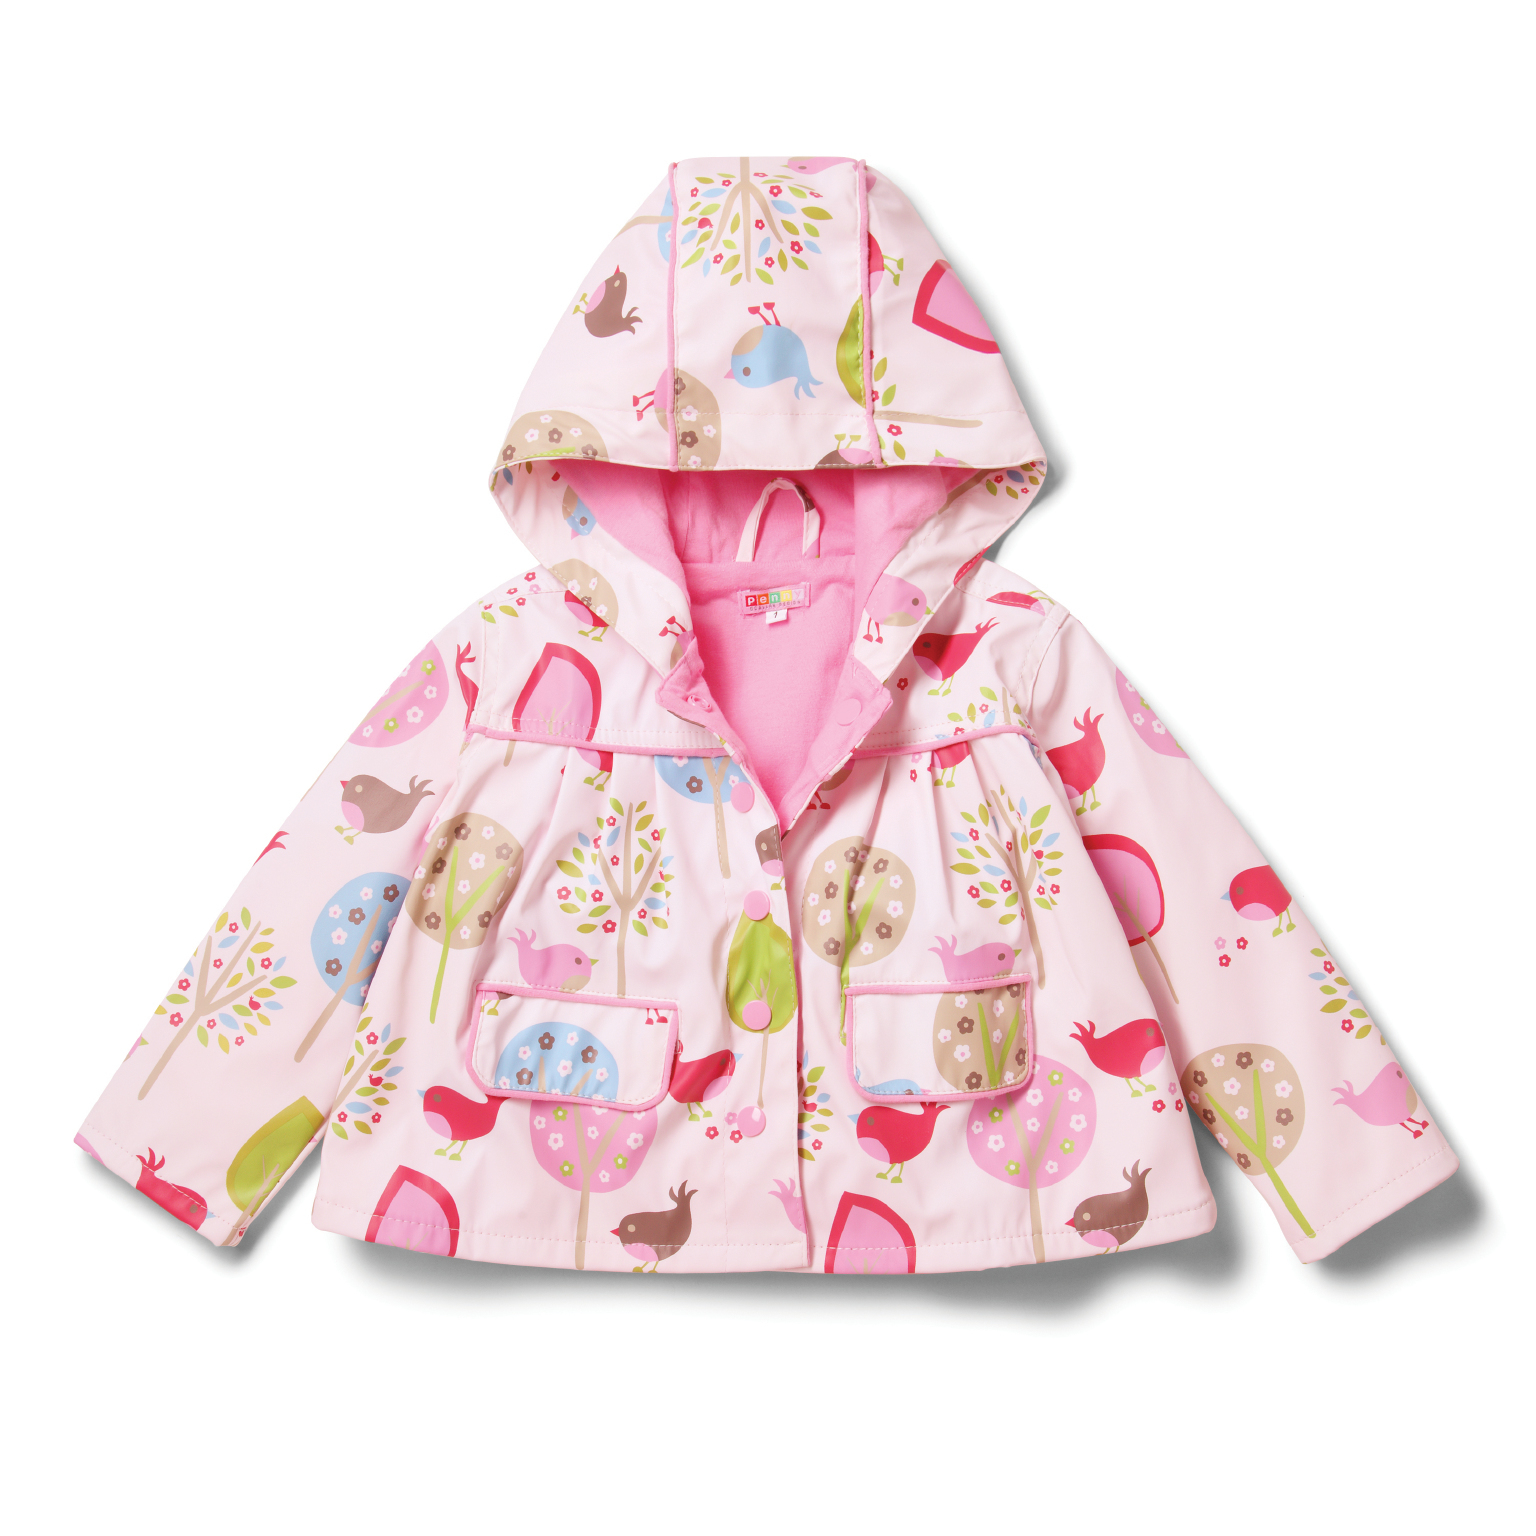 Raincoat Chirpy Bird - Size 3-4 image